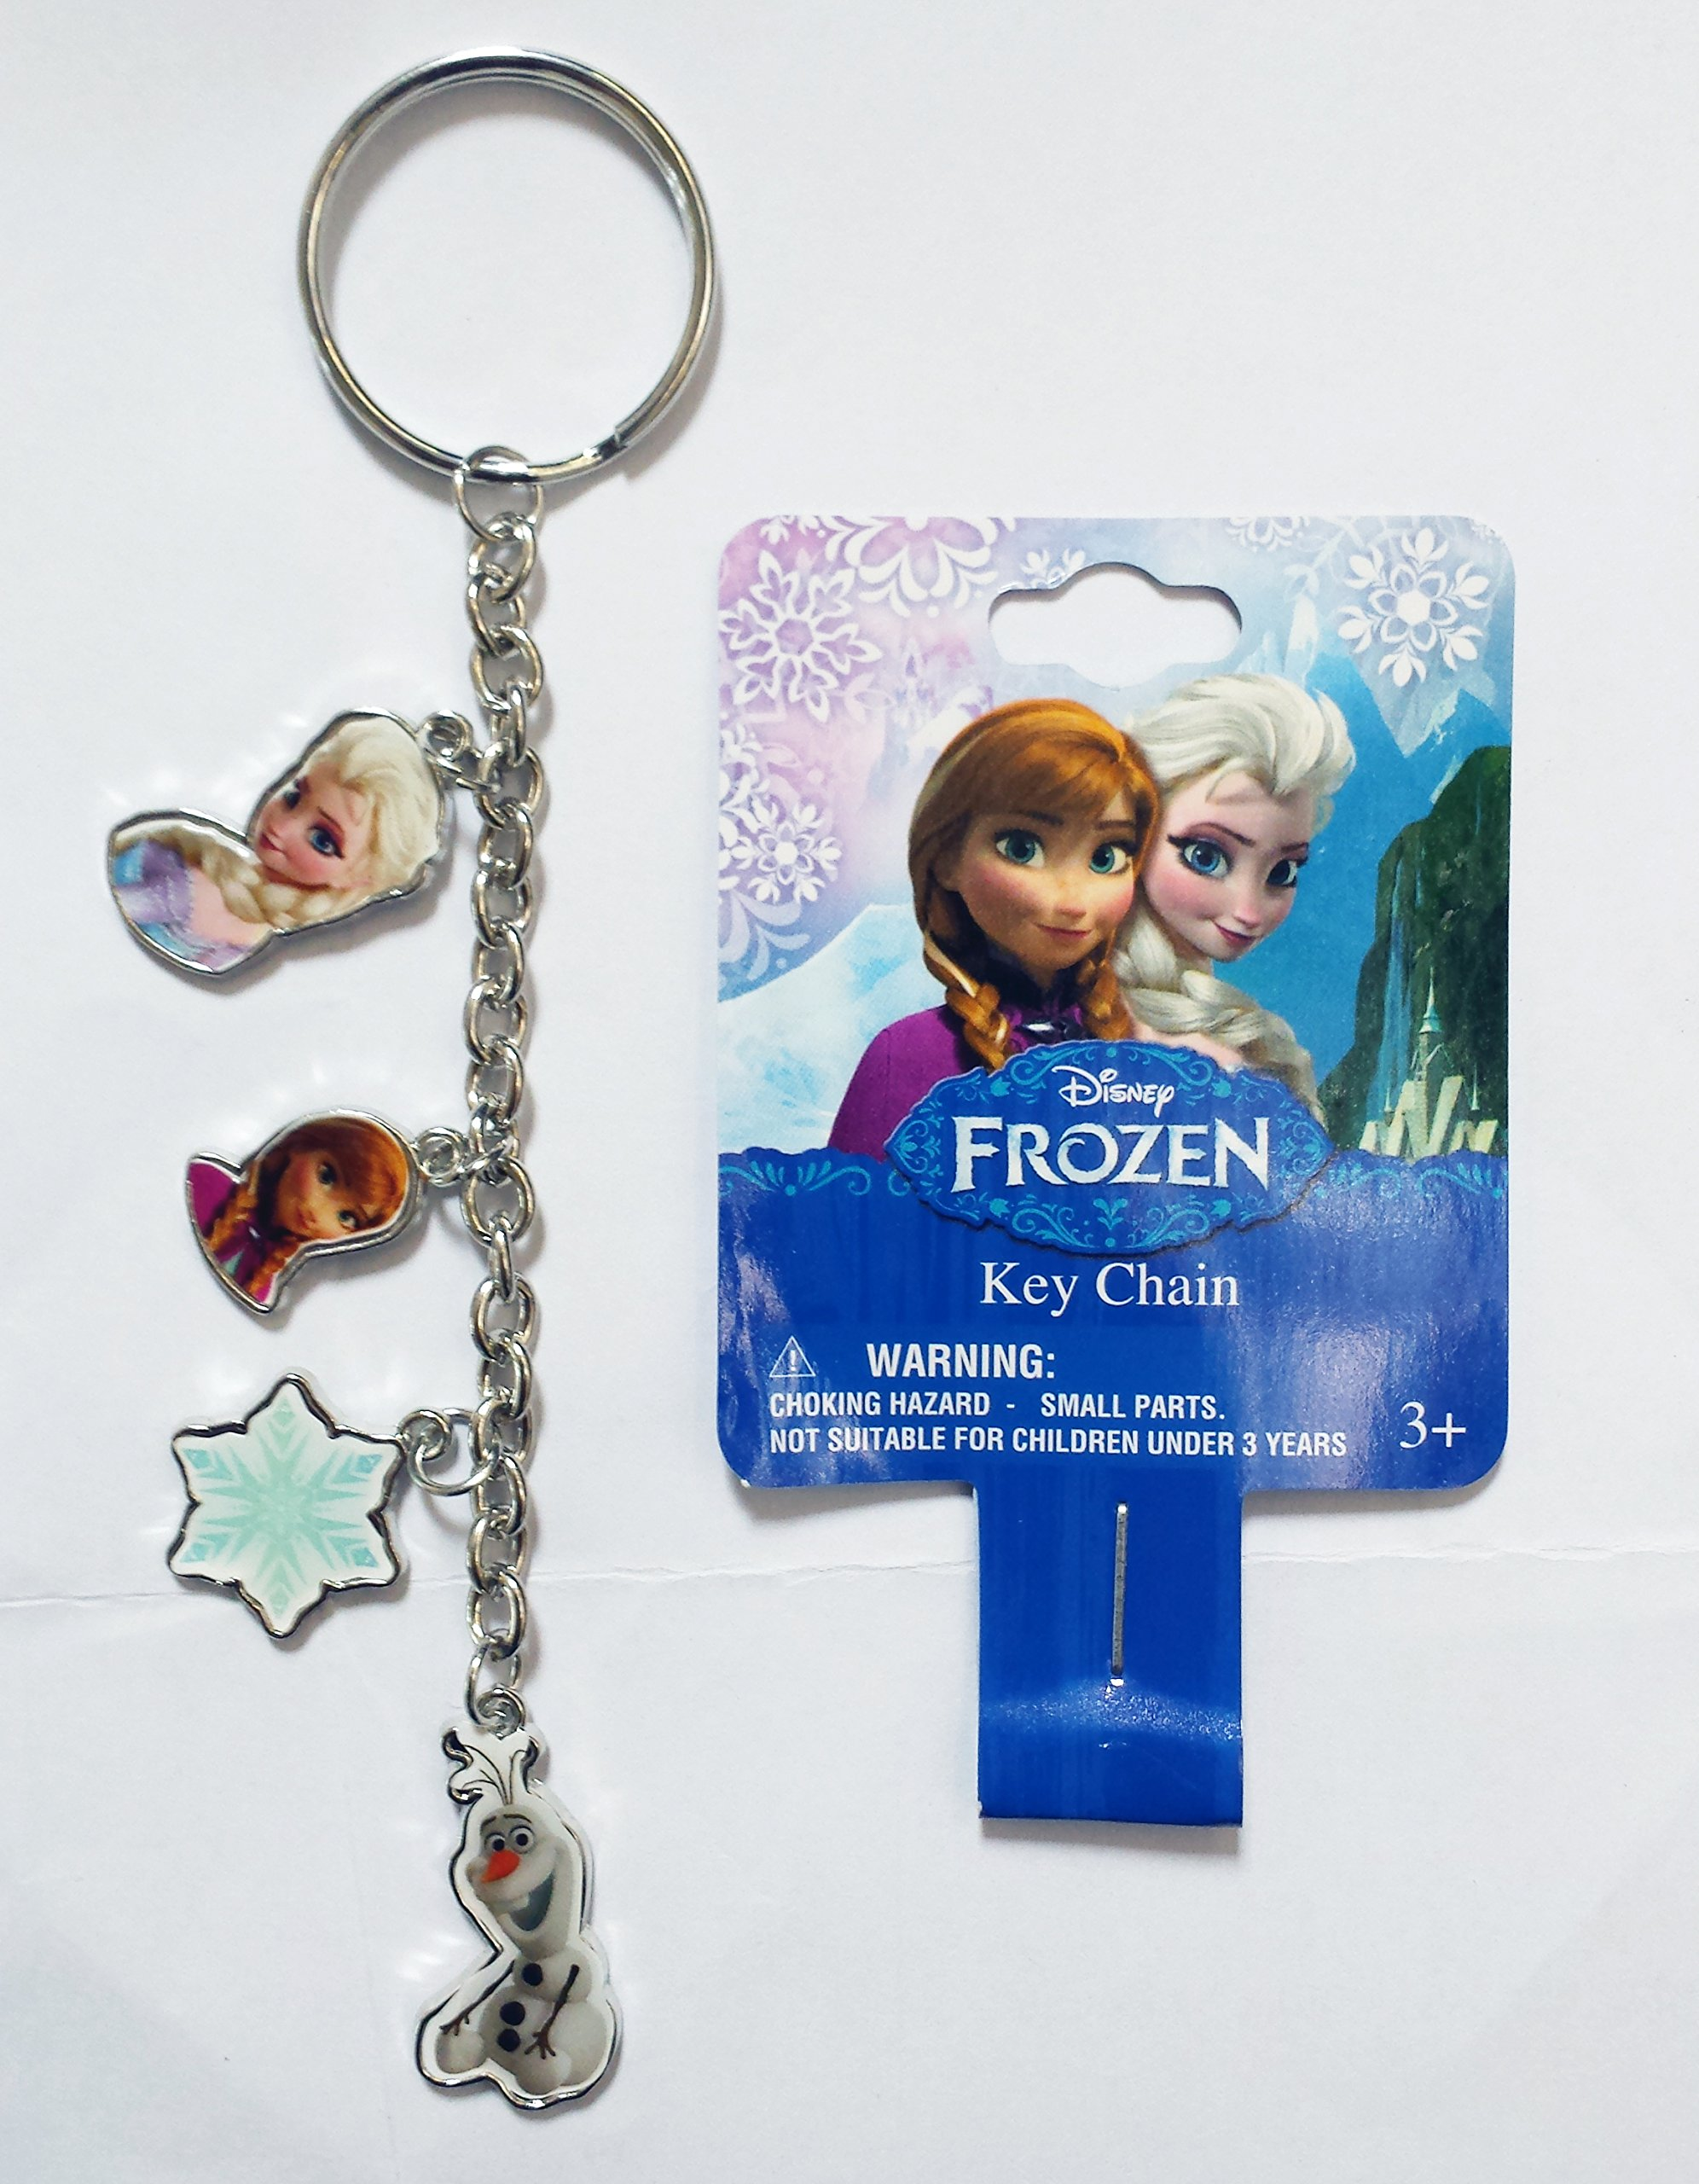 Disney Frozen Elsa Anna Olaf Keychain Dangler product image